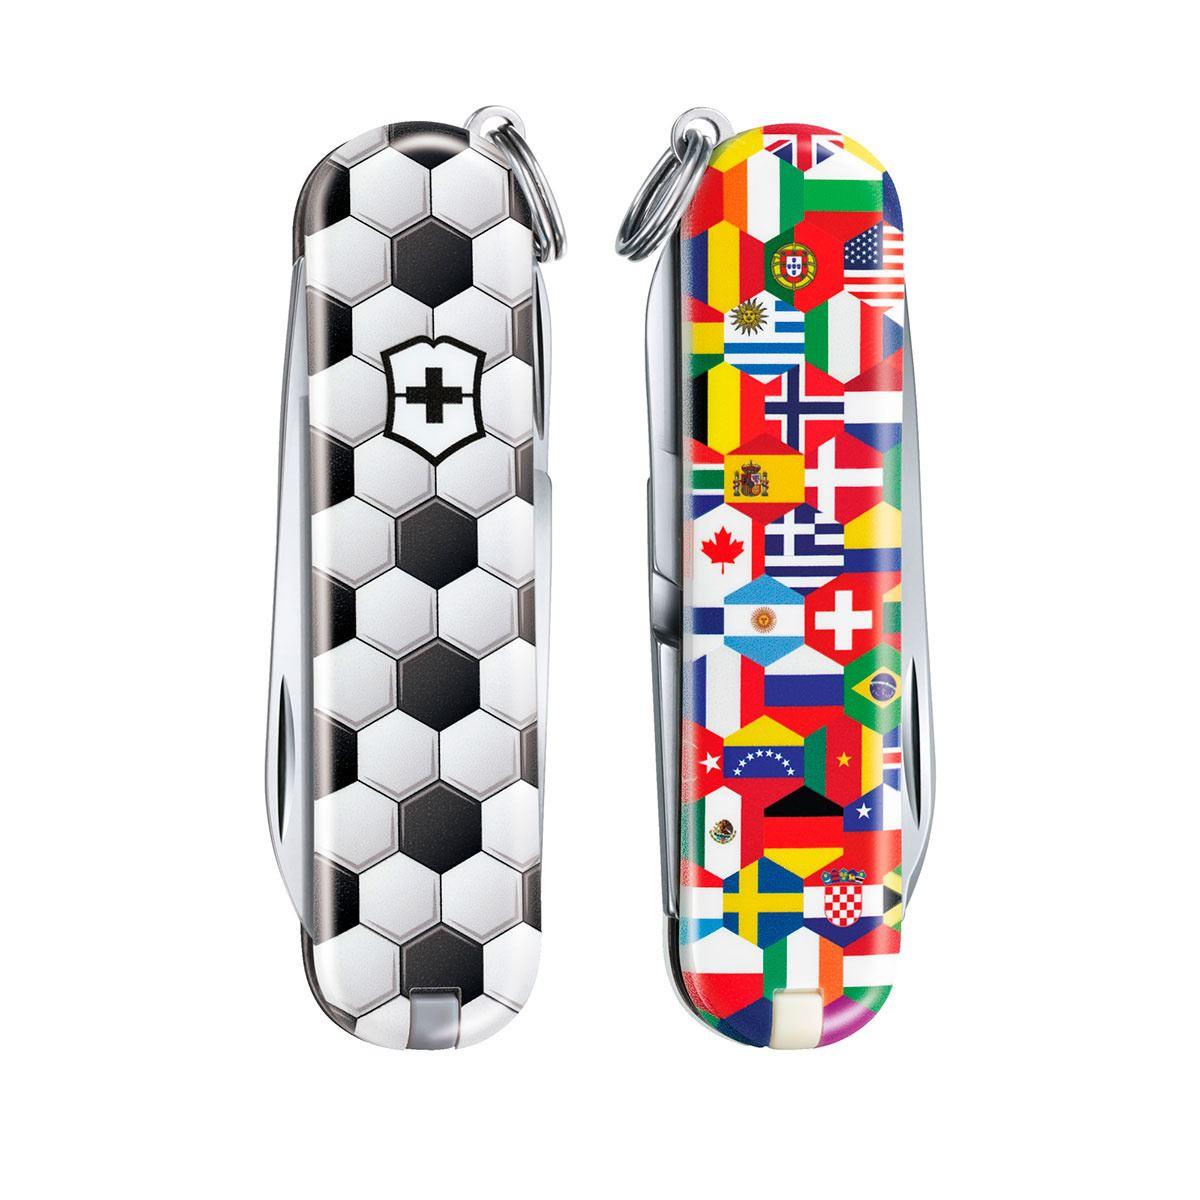 Navaja Victorinox Classic Limited Edition 2020 World of Soccer